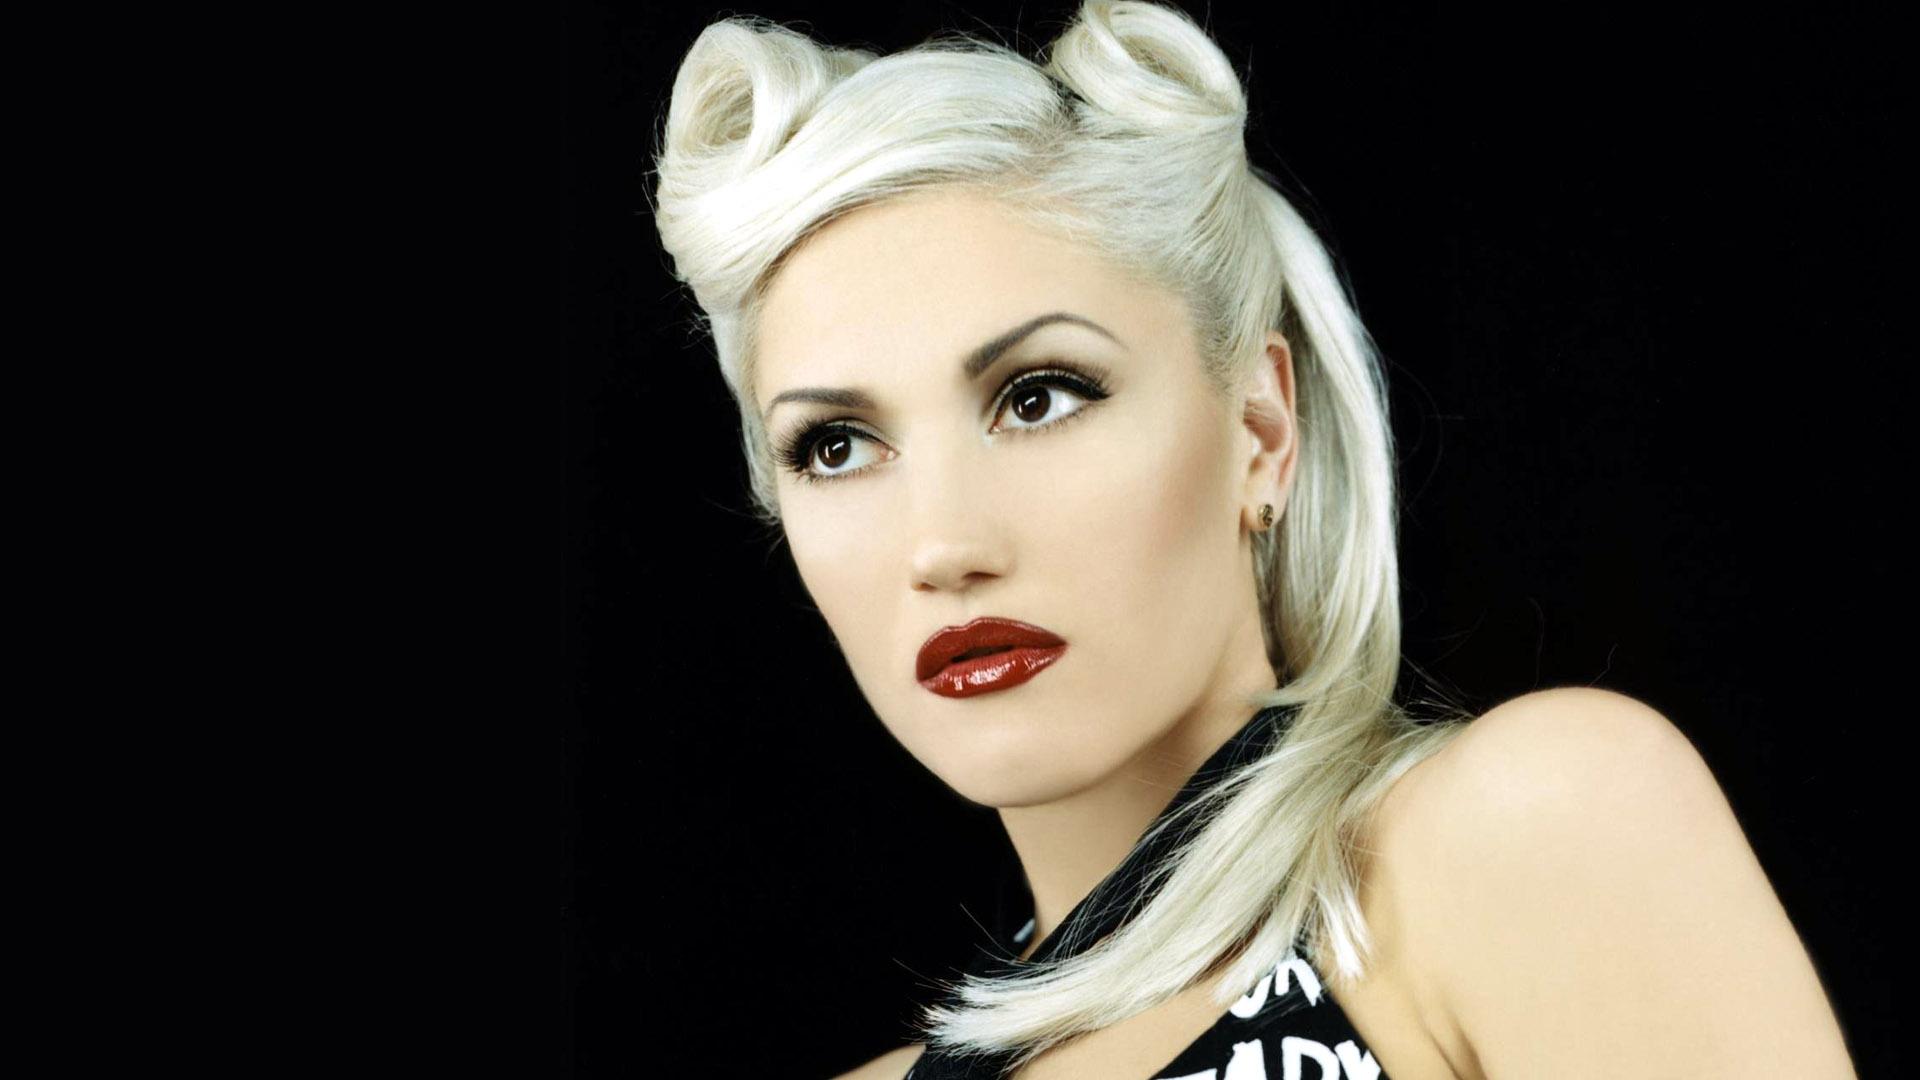 Gwen Stefani gets restraining order against obsessed fan